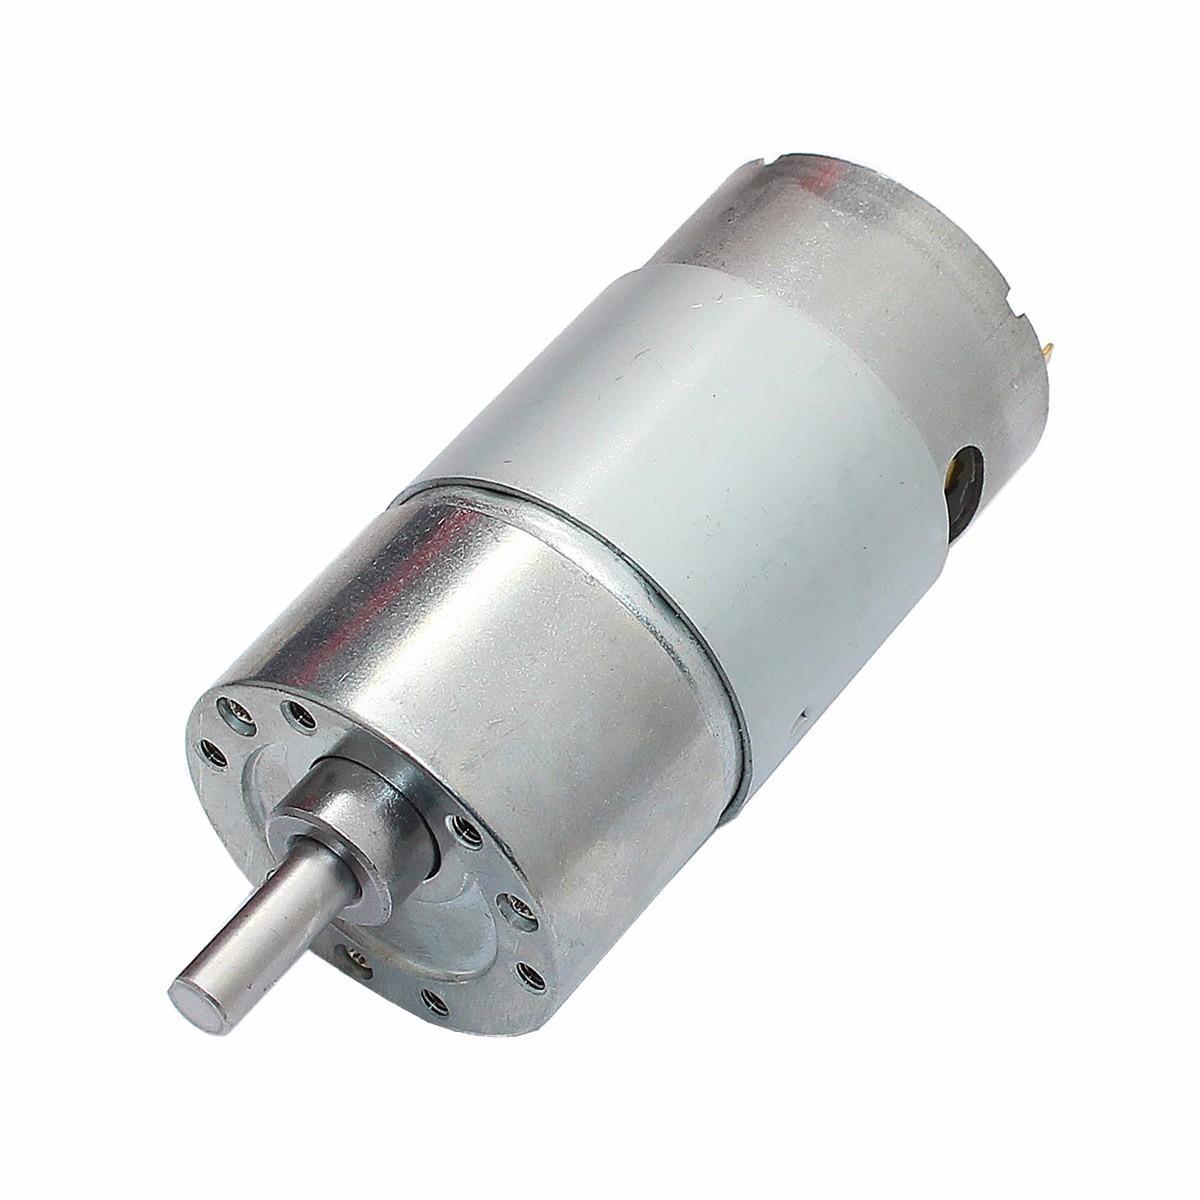 KingLan N20 Dc12V 100Rpm Gear Motor High Torque Electric Gear Box Motore